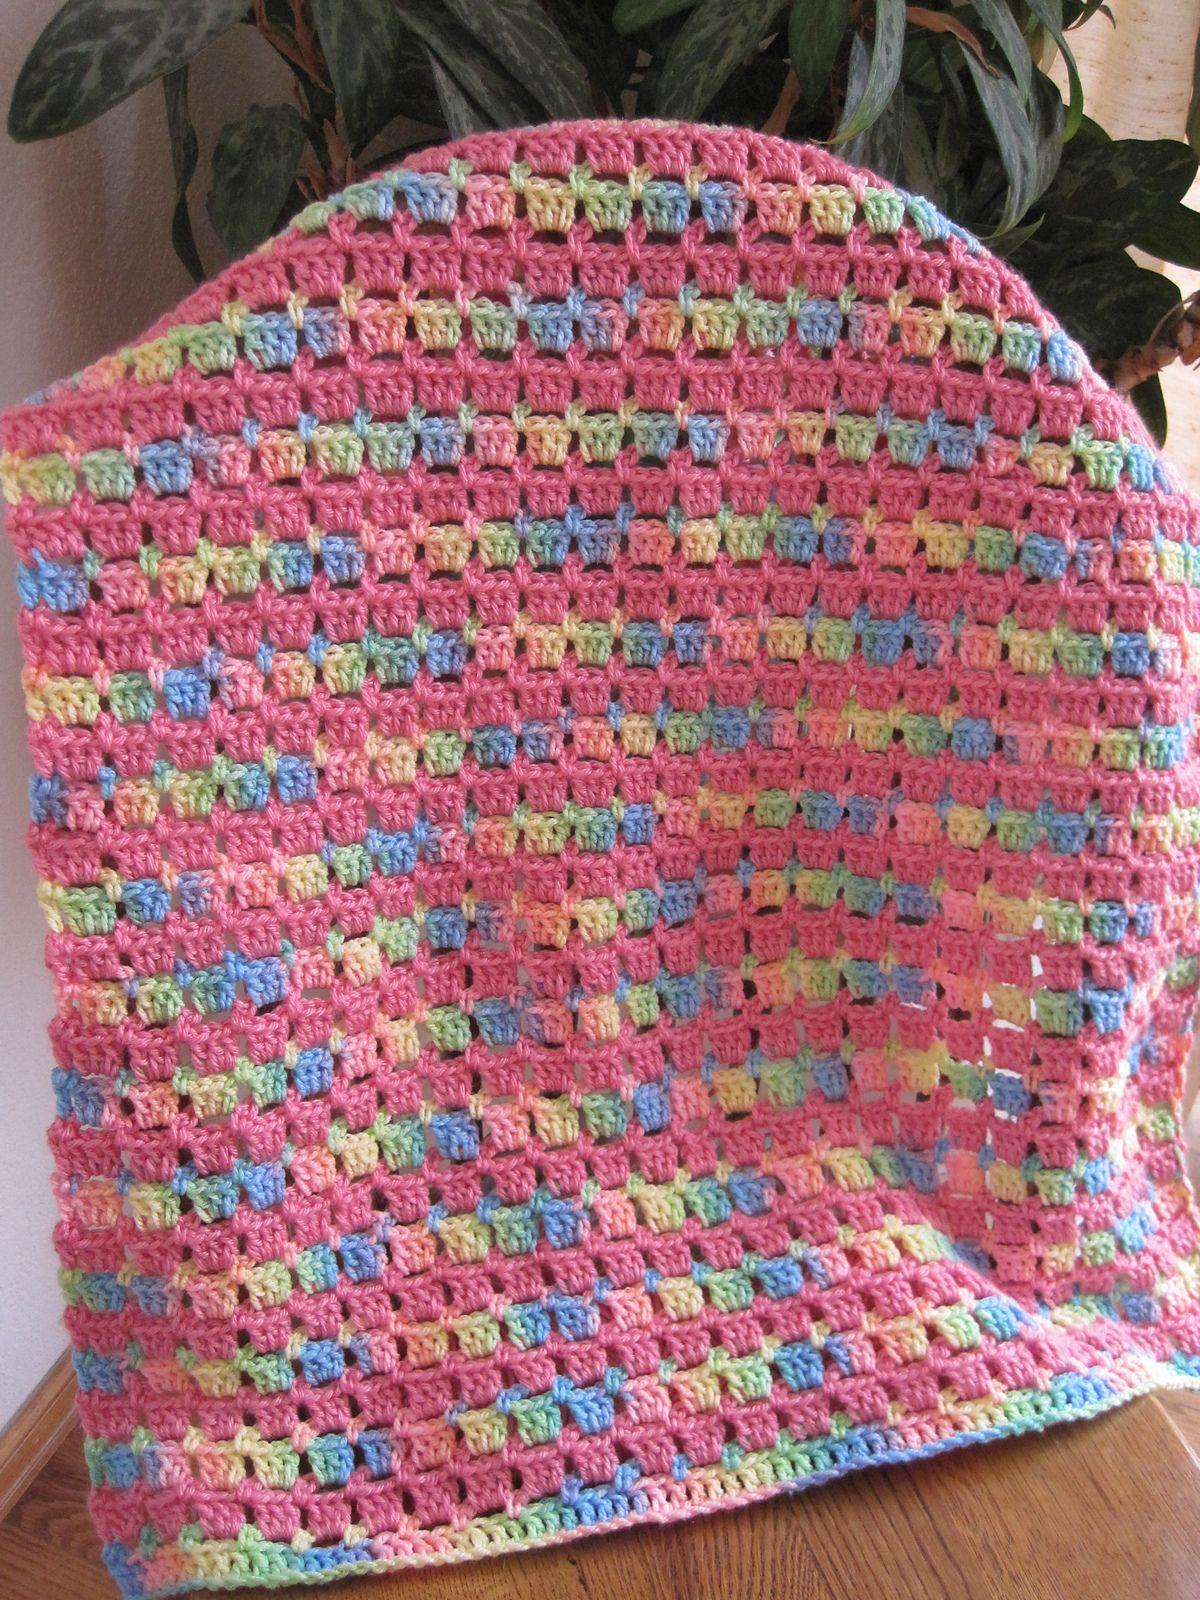 Block-Stitch Baby Blanket By Kathy North - Free Crochet Pattern ...